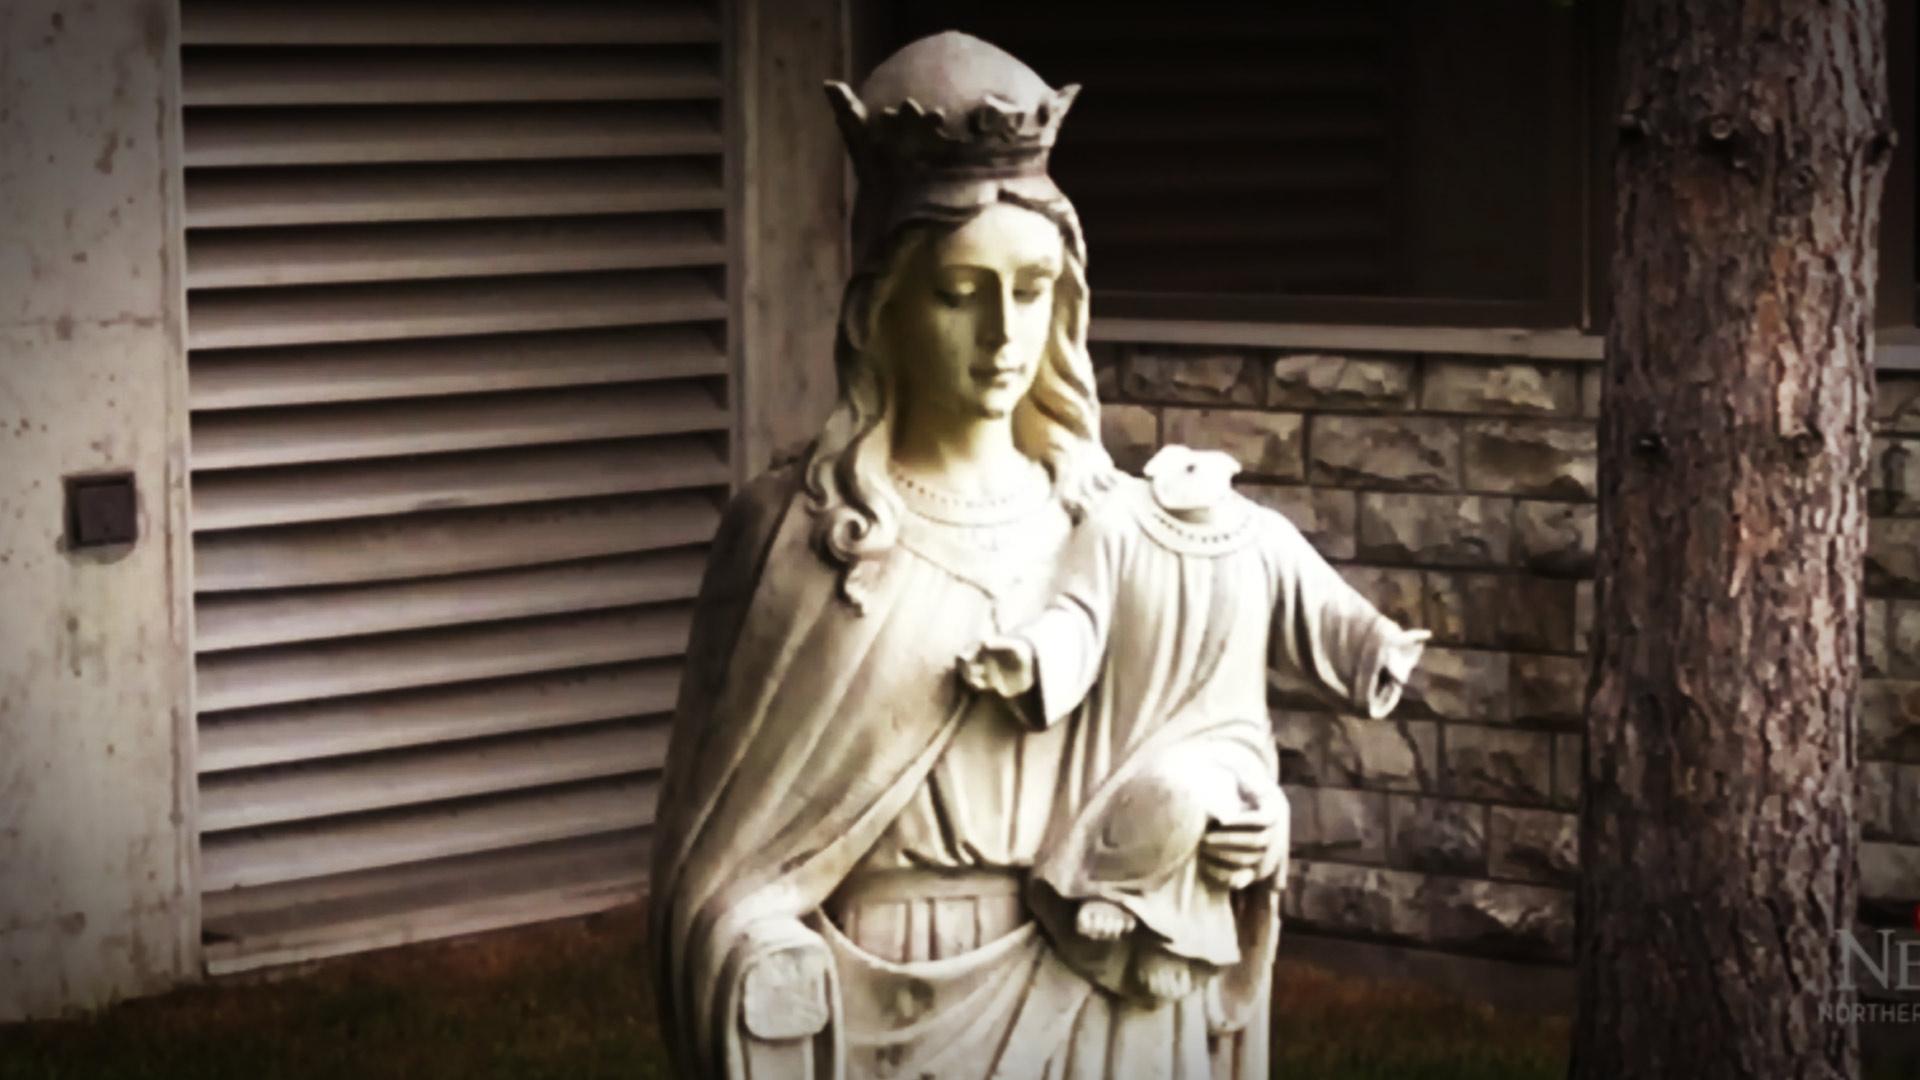 Baby Jesus statue beheaded (again) at Catholic church in Sudbury